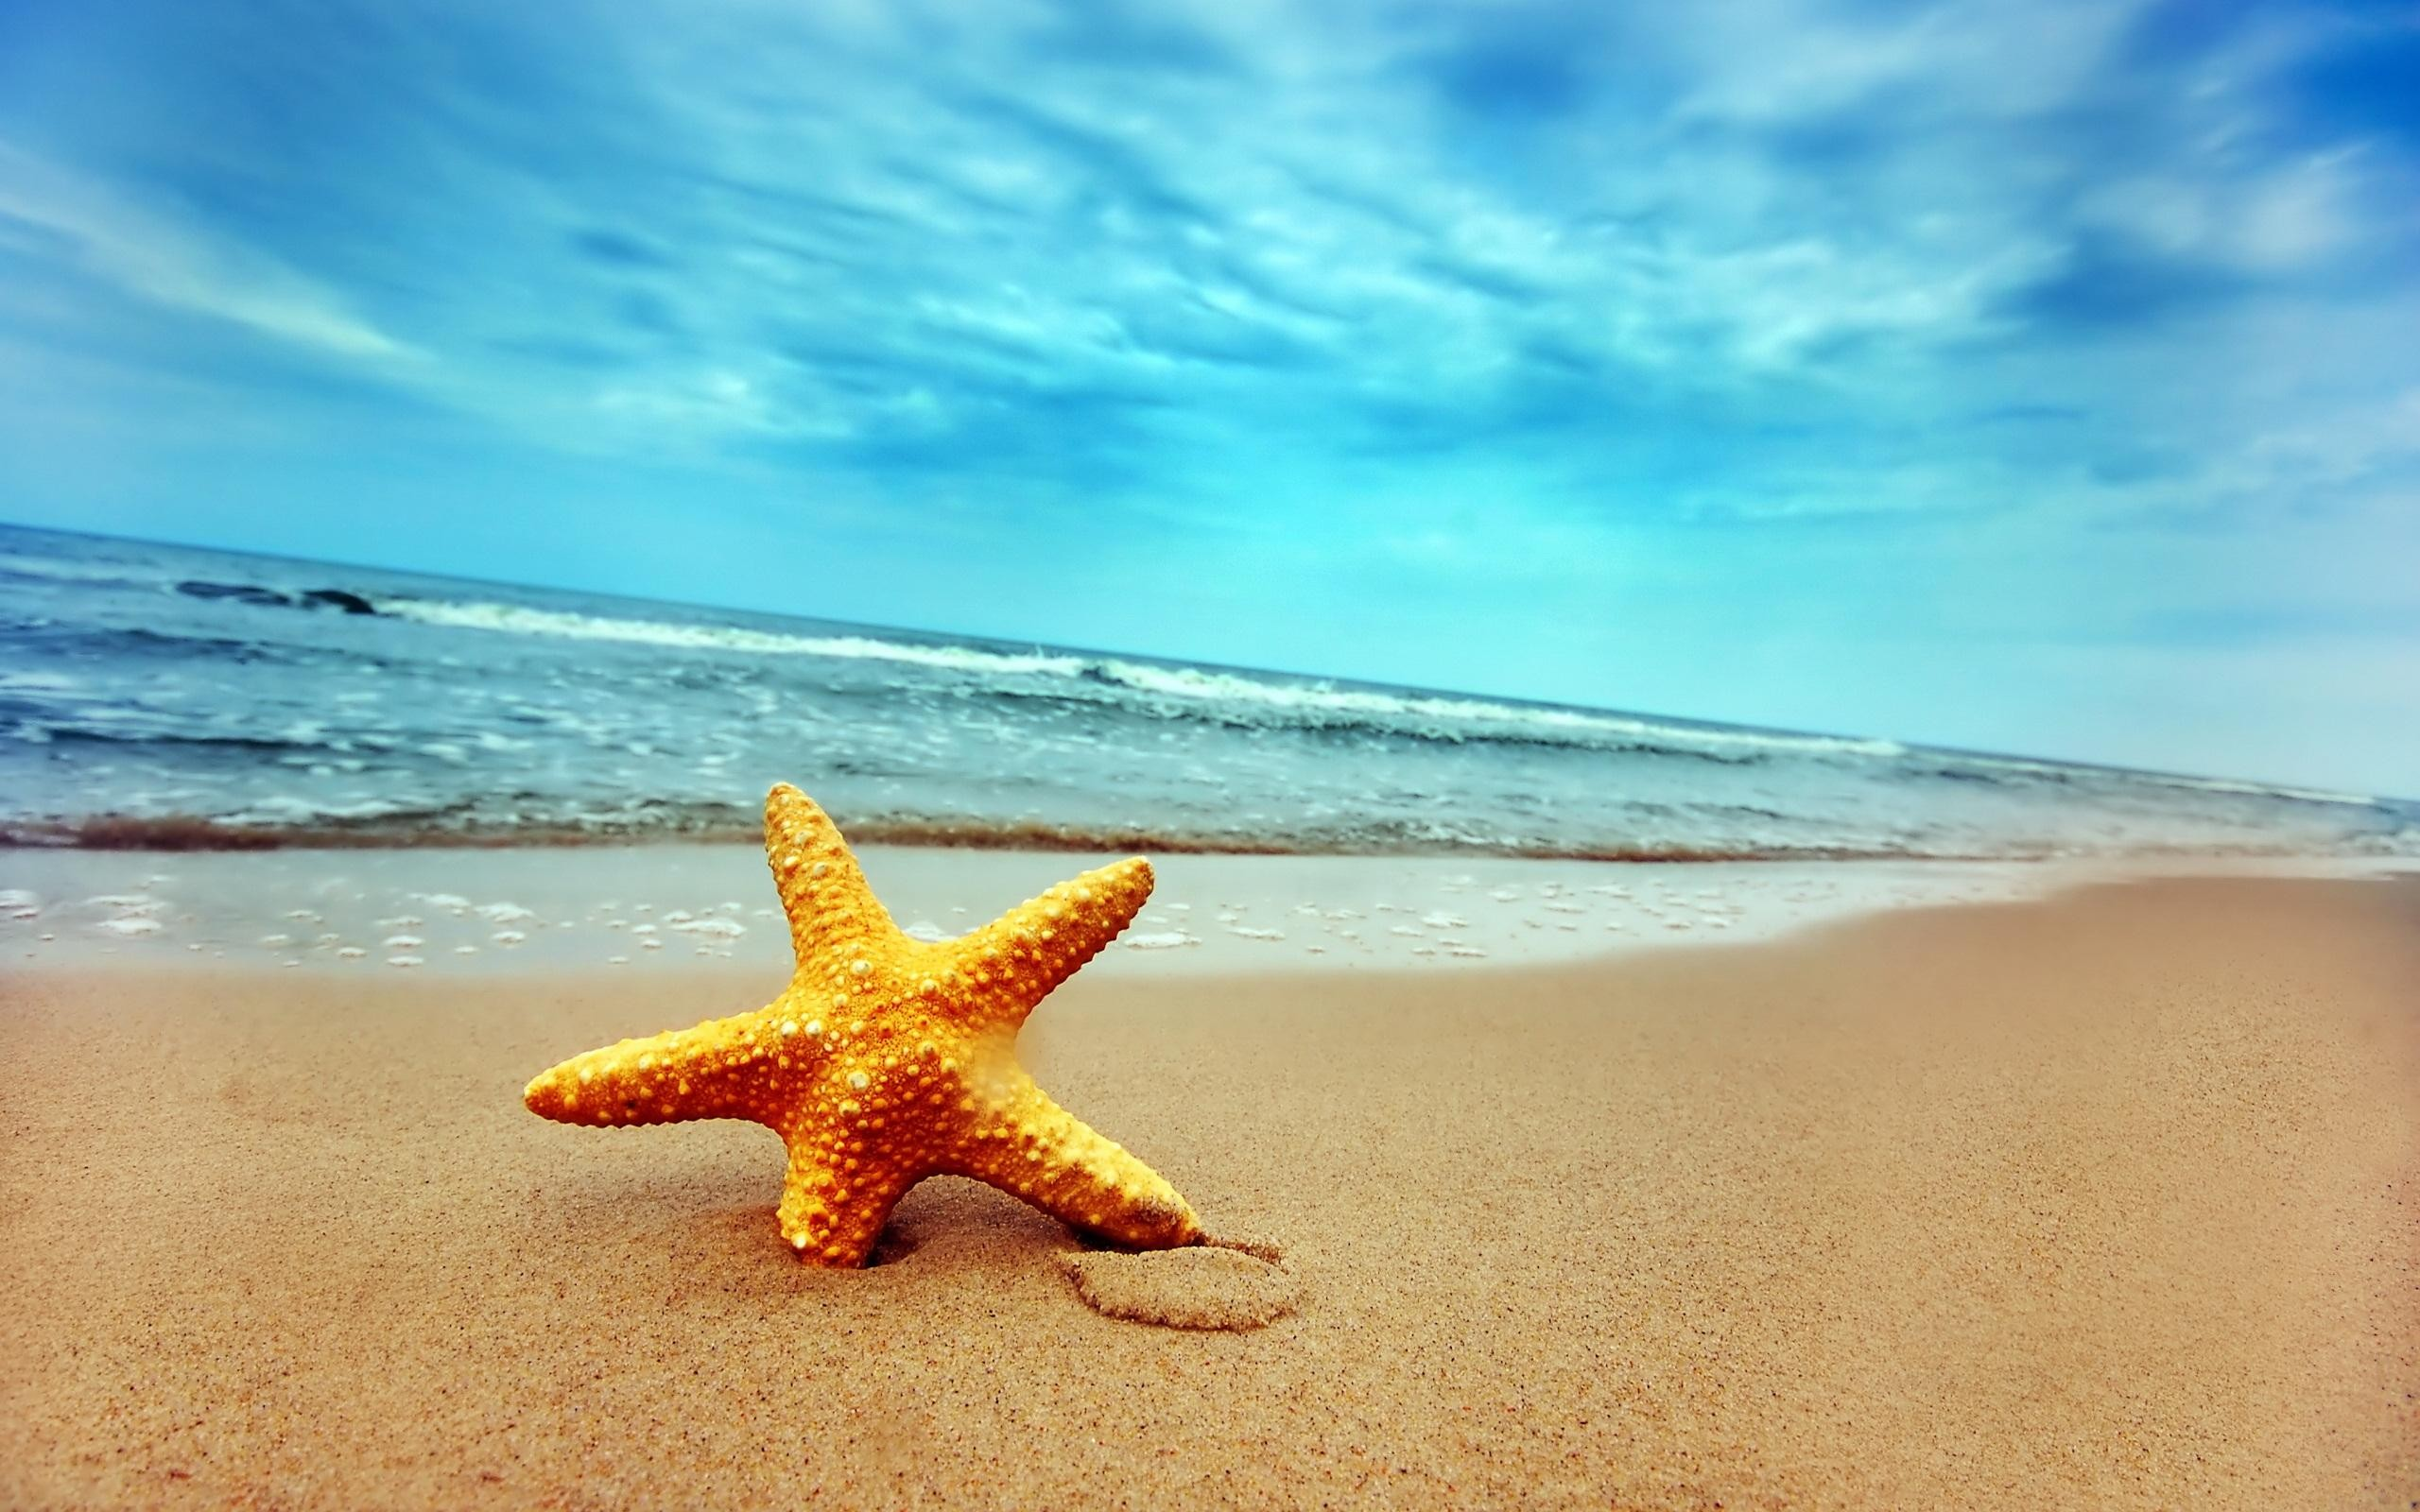 35 Desktop Backgrounds Beach Download Free Beautiful Full Hd